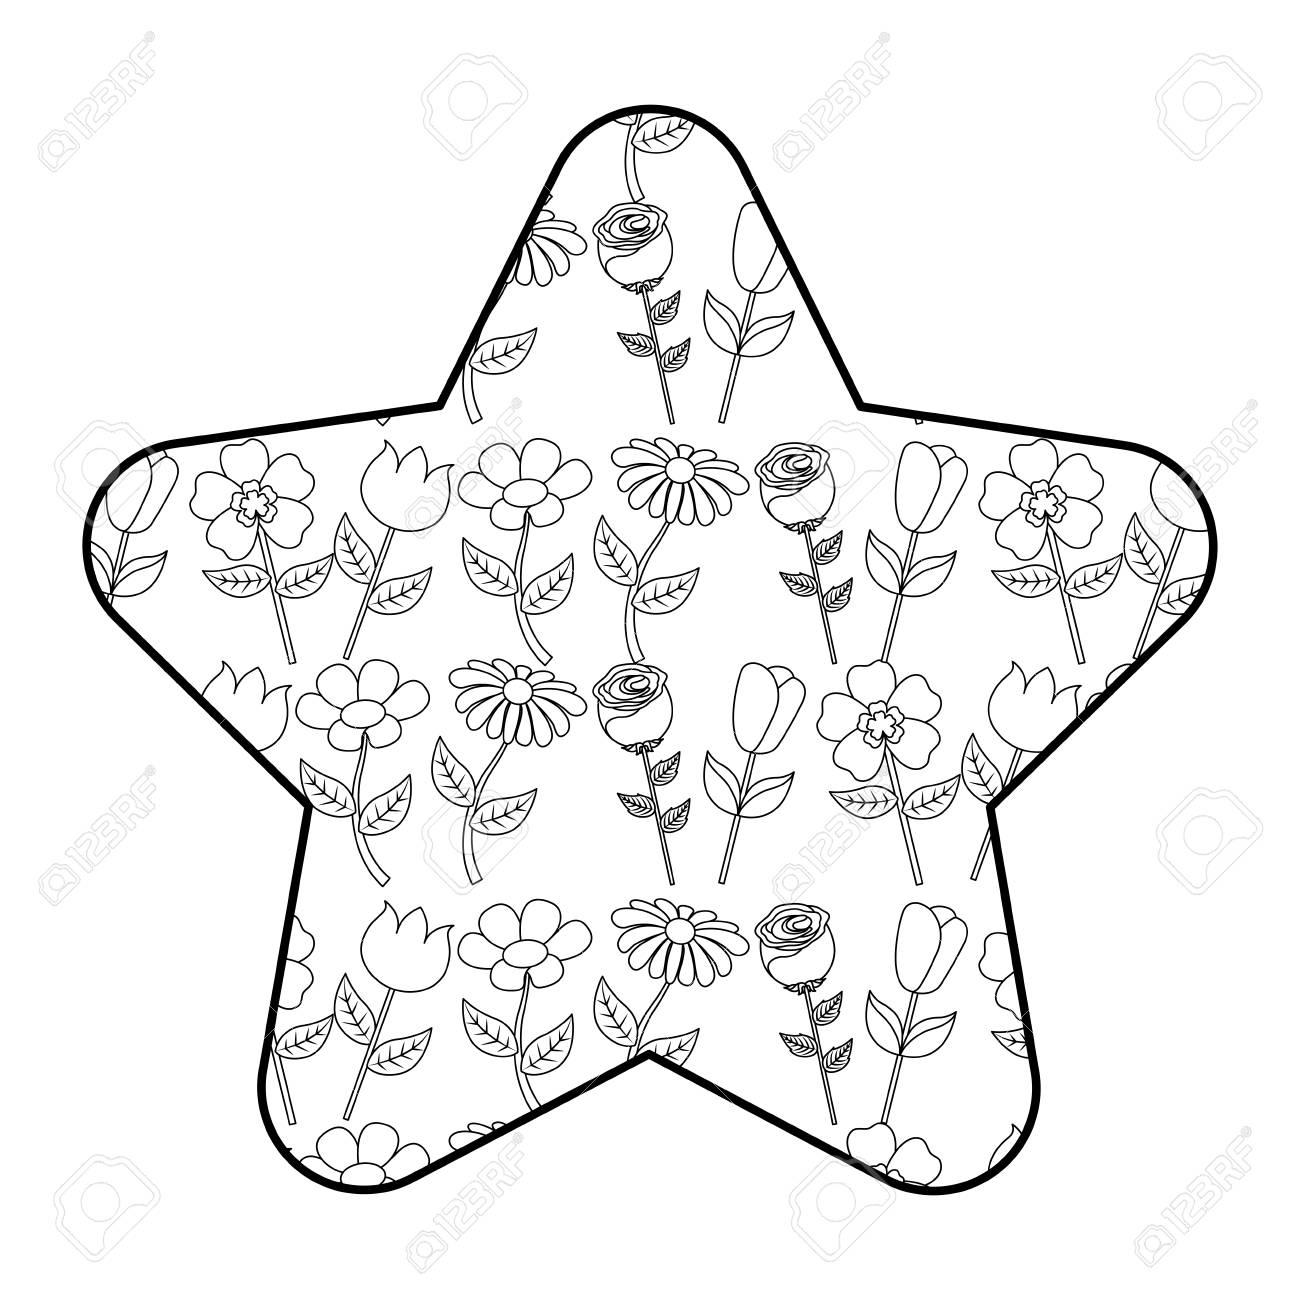 cute star pattern flower petal stem spring style vector illustration outline design stock vector 94471945